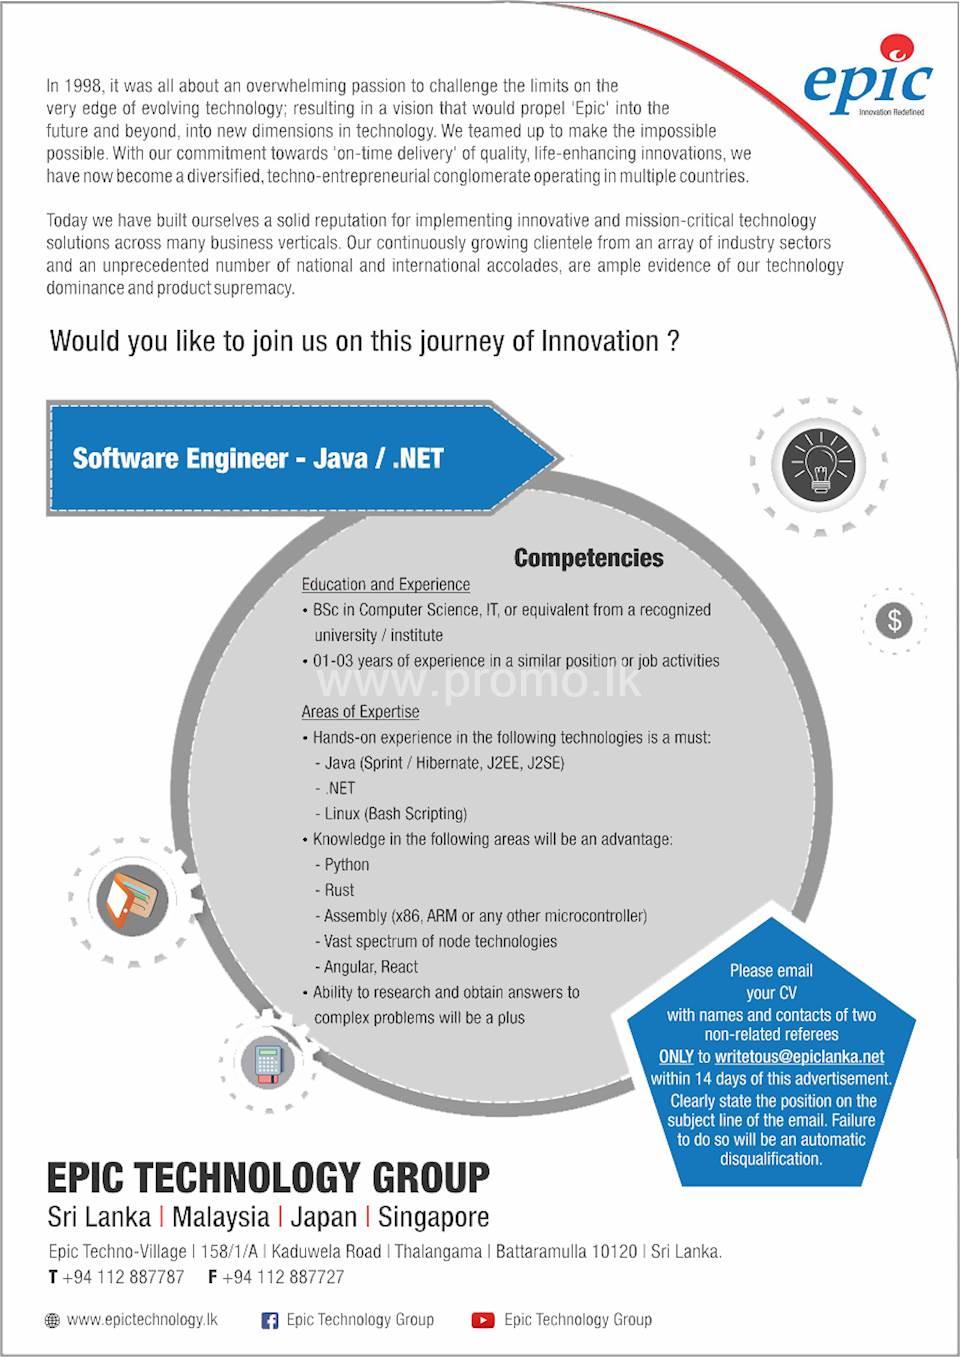 Software Engineer - Java / .NET